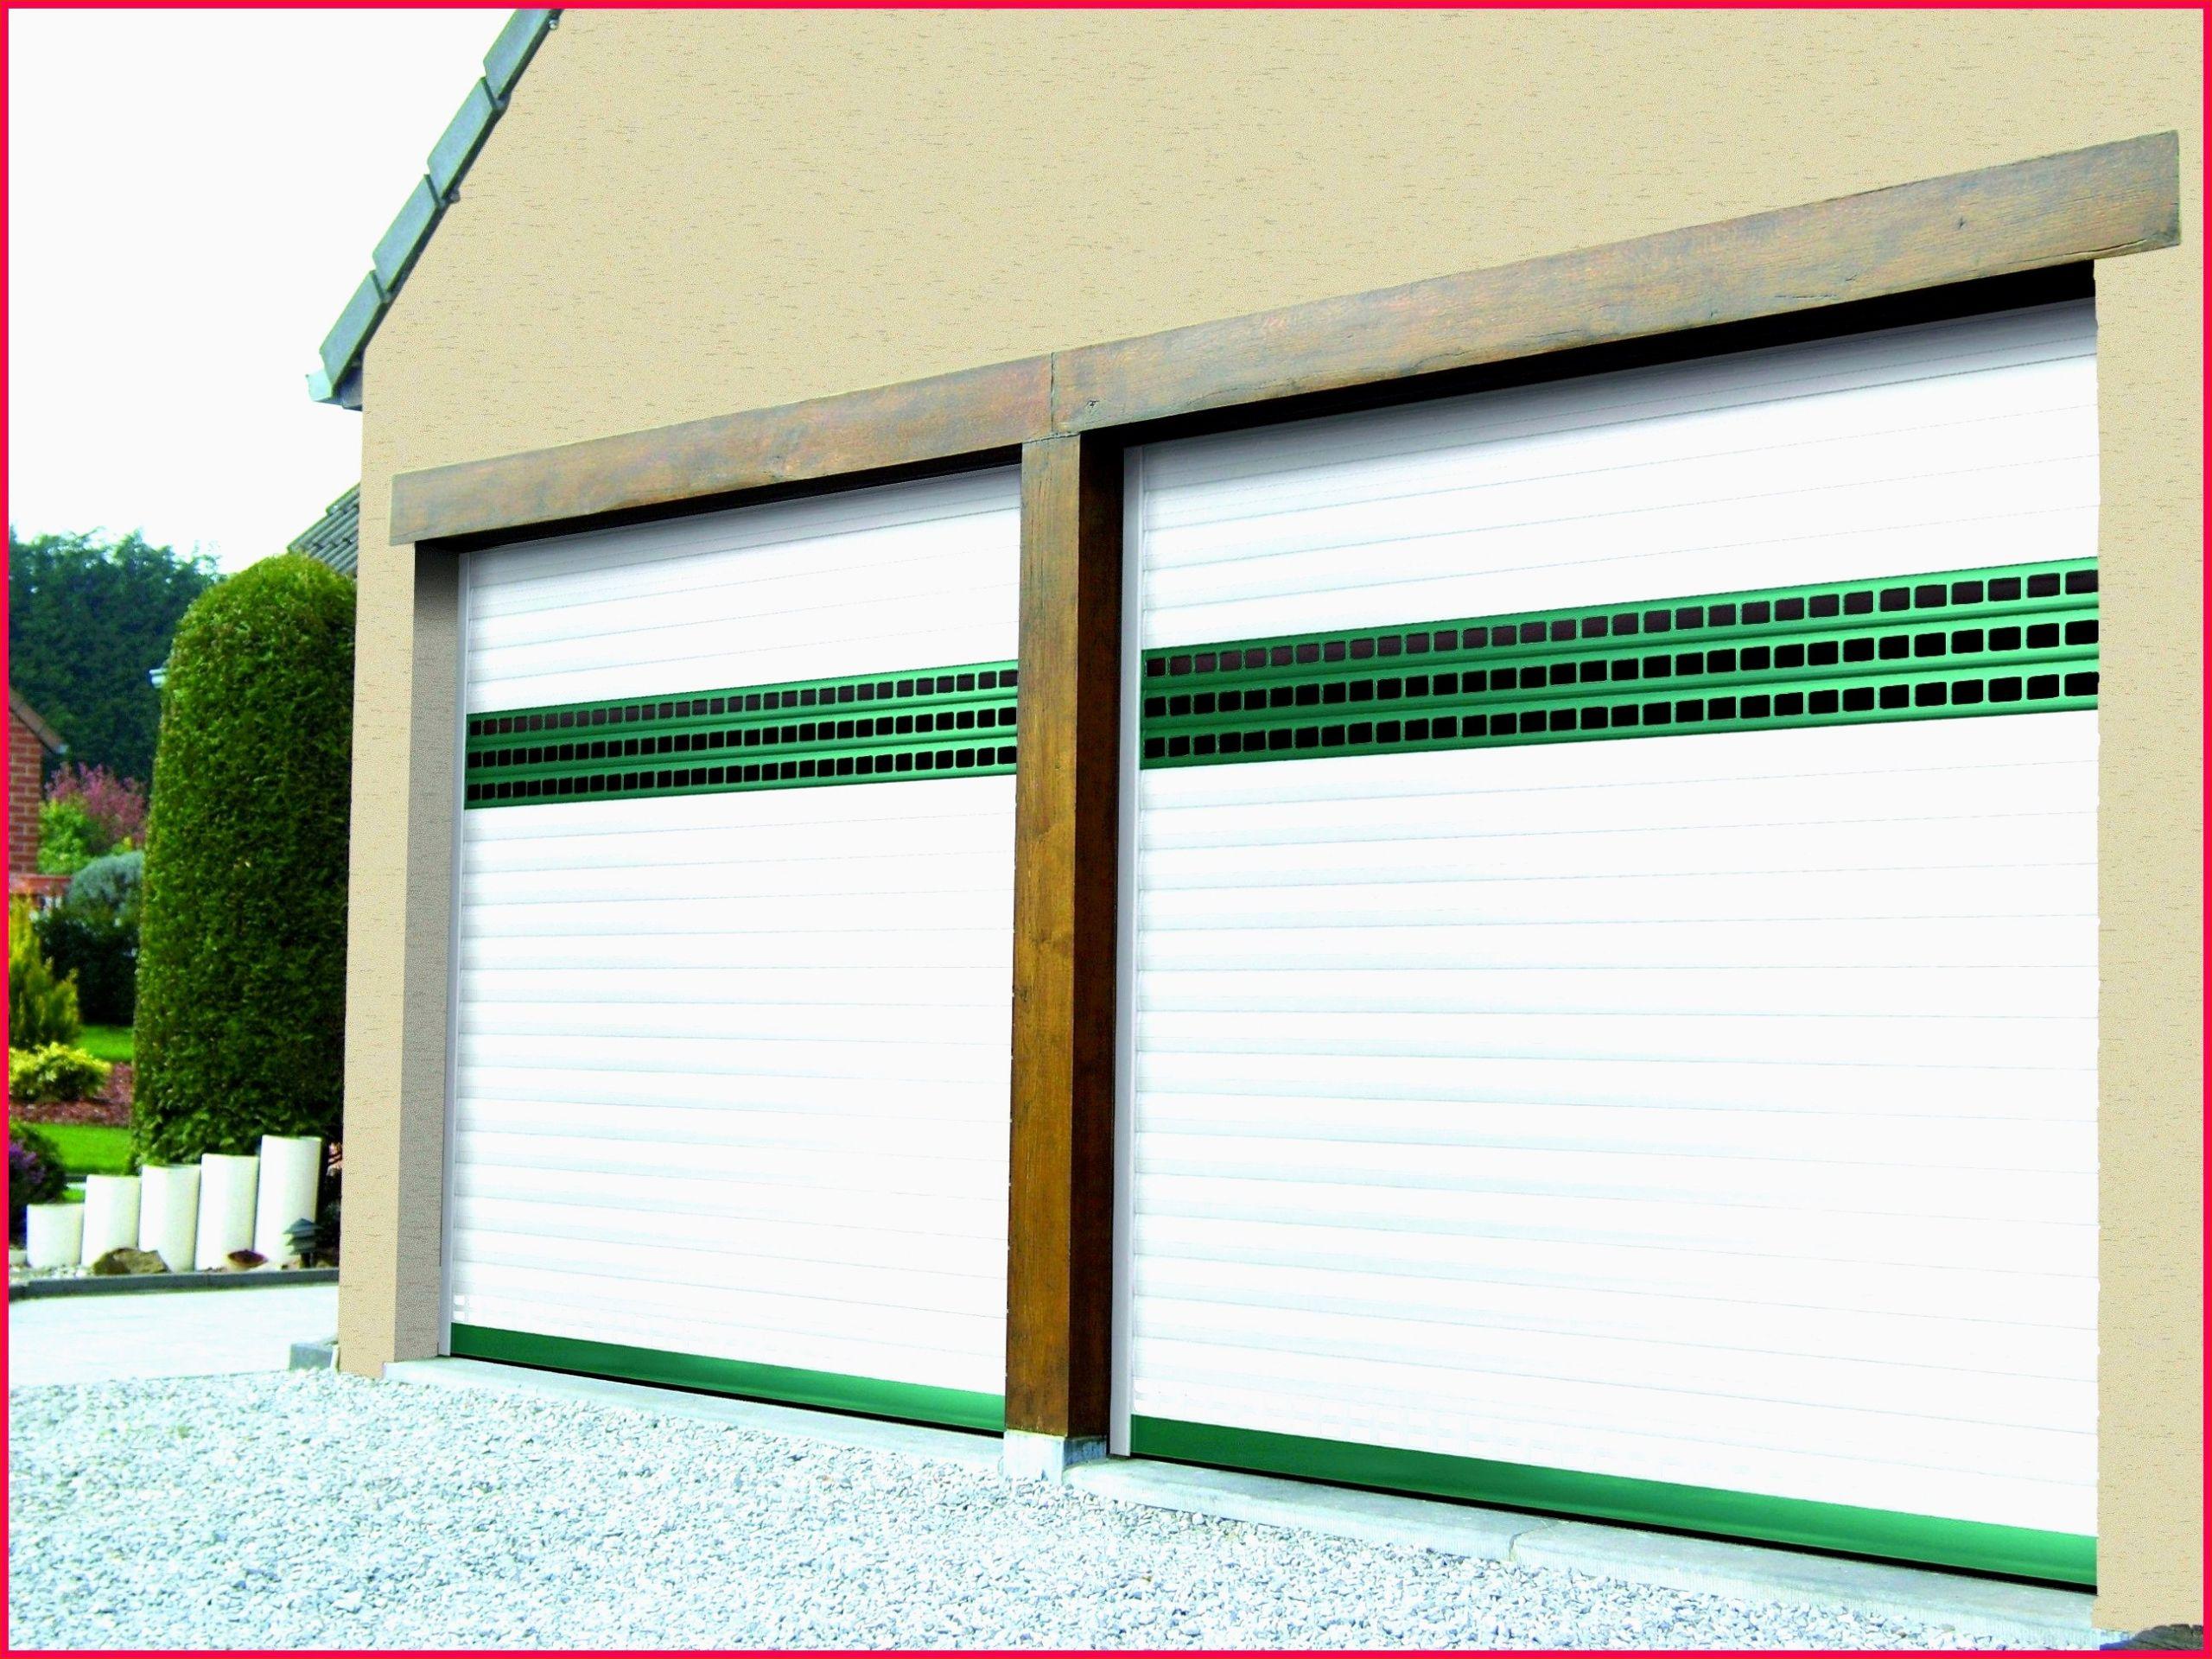 toile veranda store exterieur vertical castorama of toile veranda 1